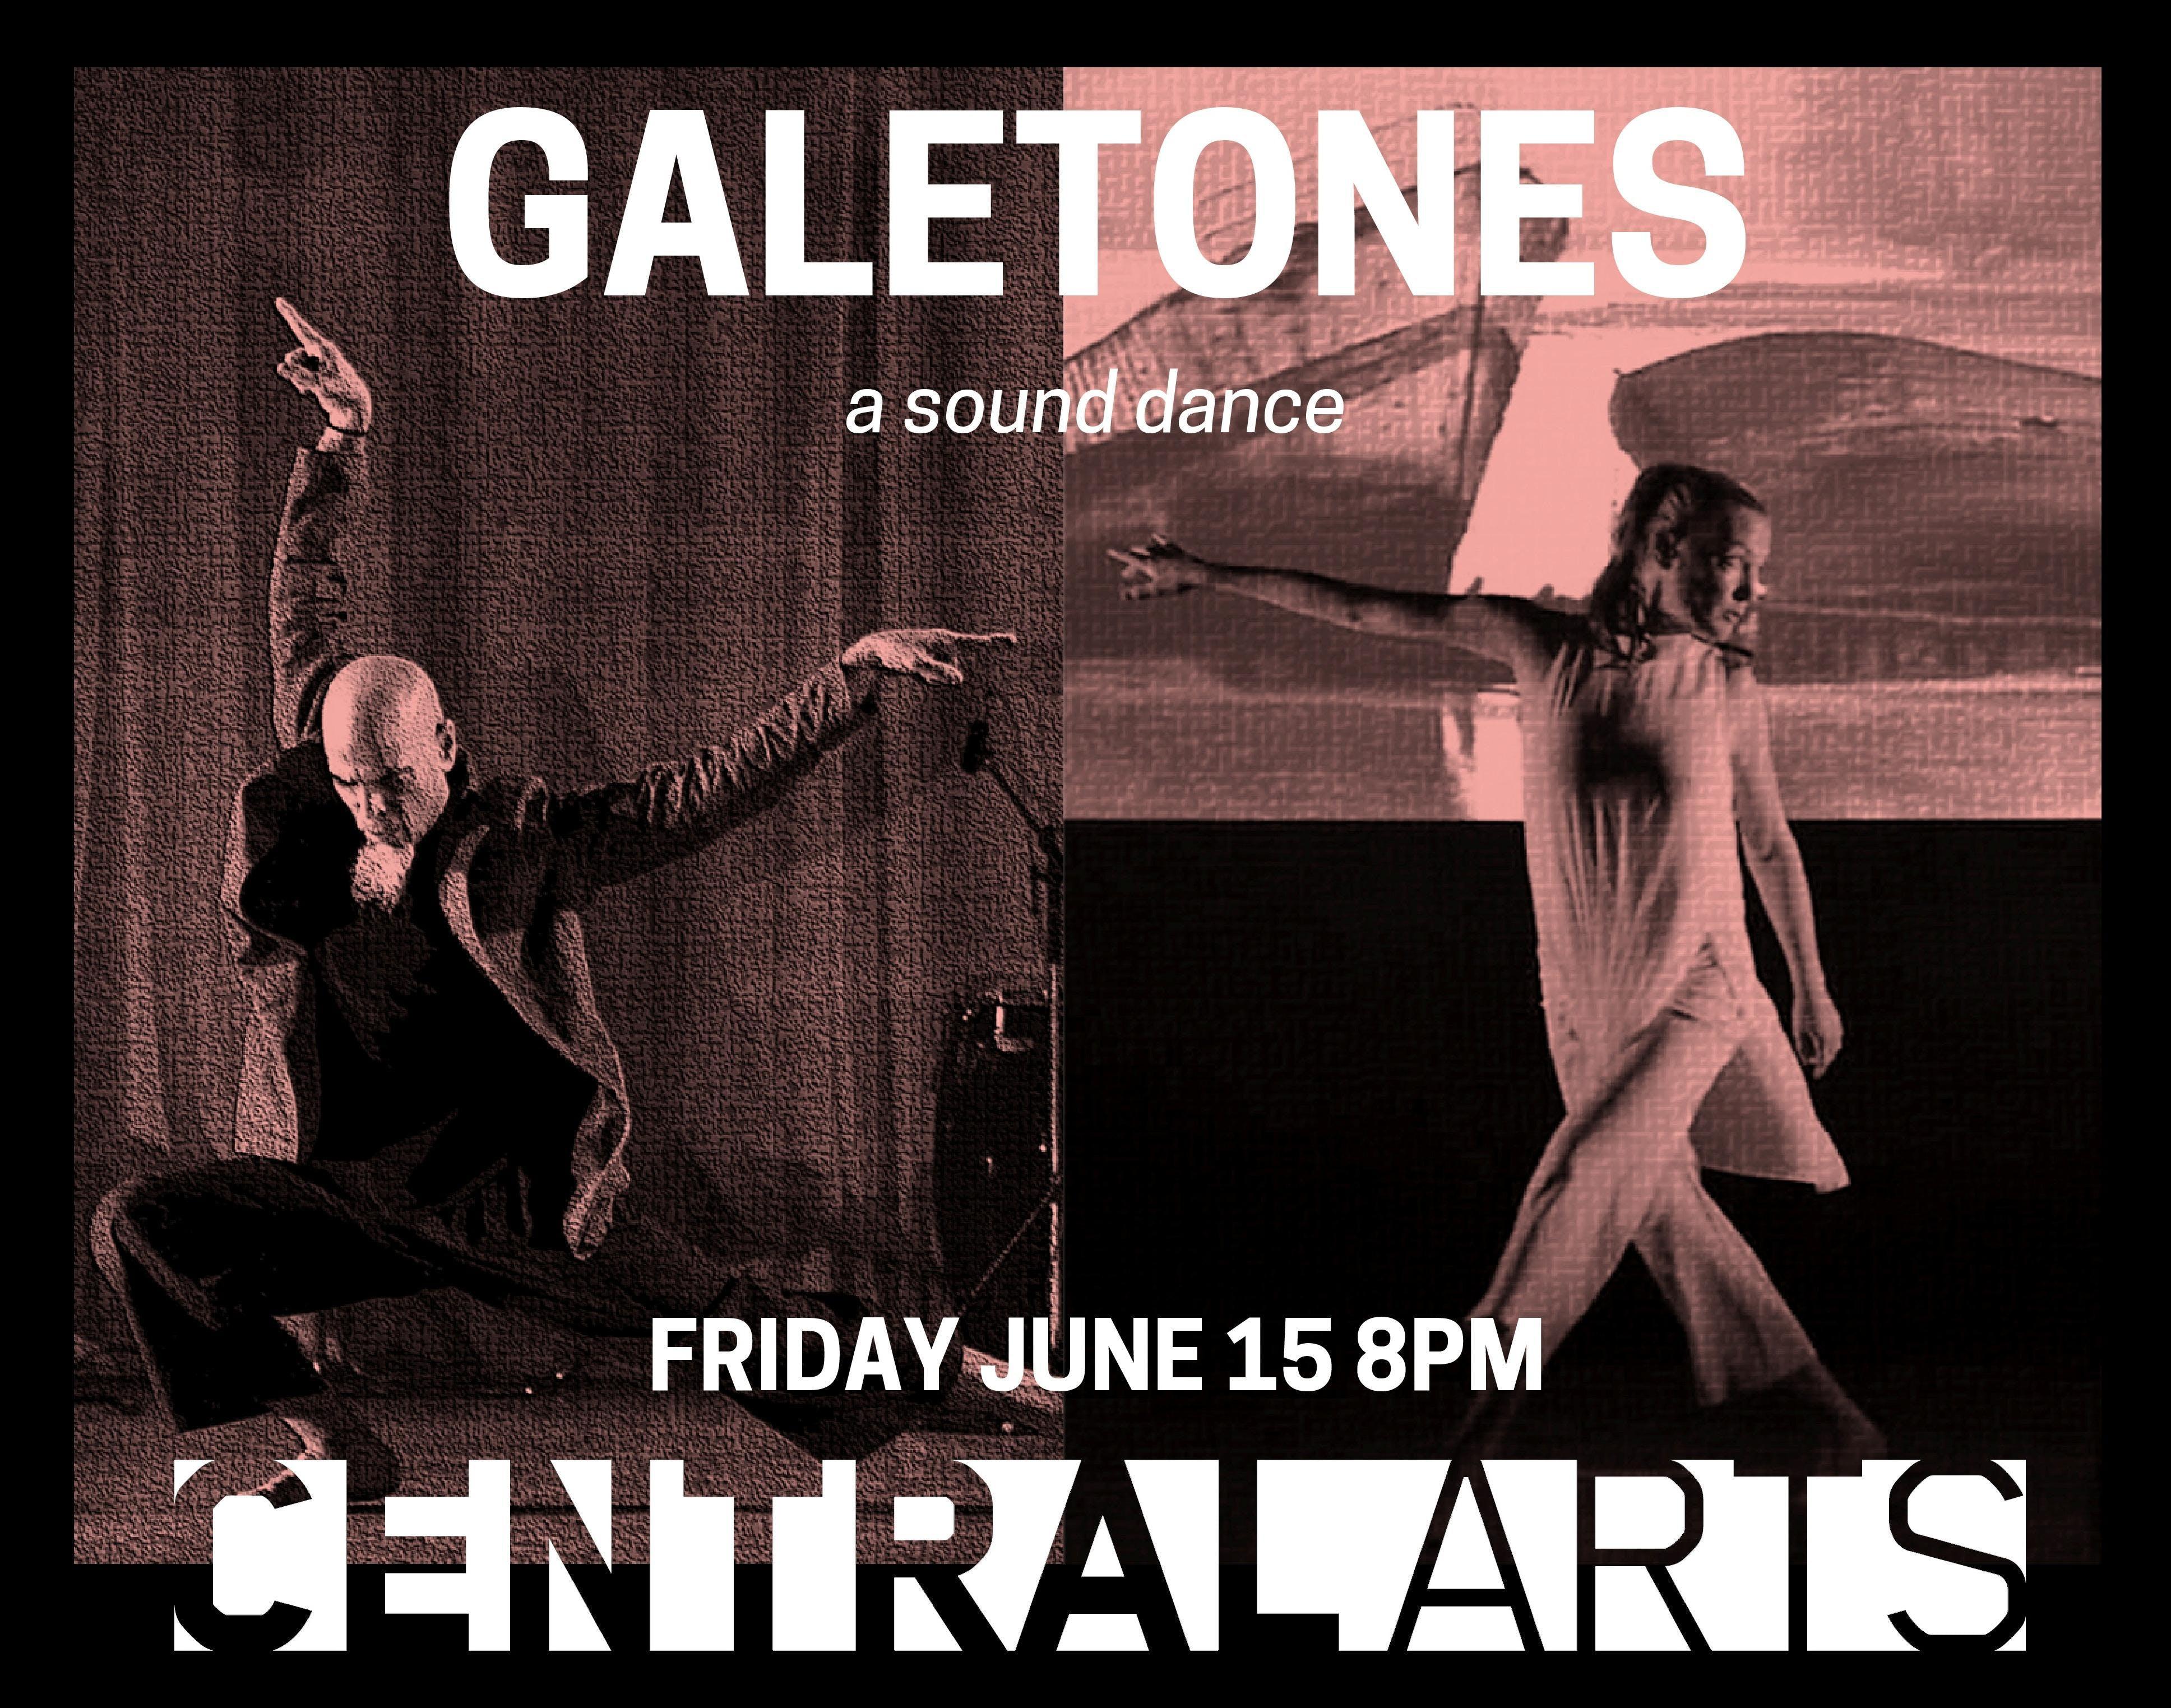 Galetones